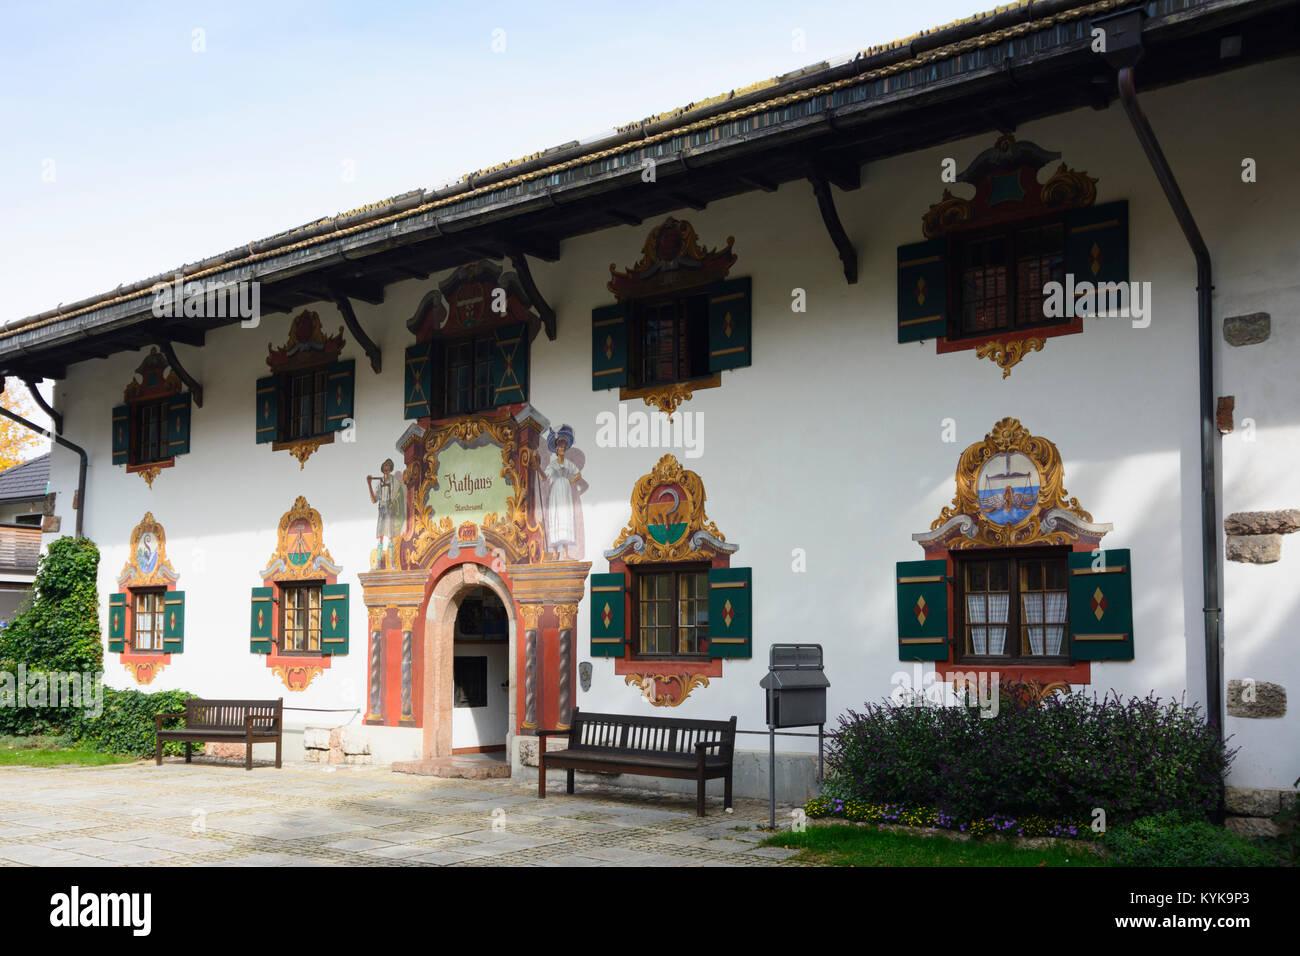 Ruhpolding: Town Hall with paintings Lüftl-Malerei, Oberbayern, Chiemgau, Upper Bavaria, Bayern, Bavaria, Germany - Stock Image